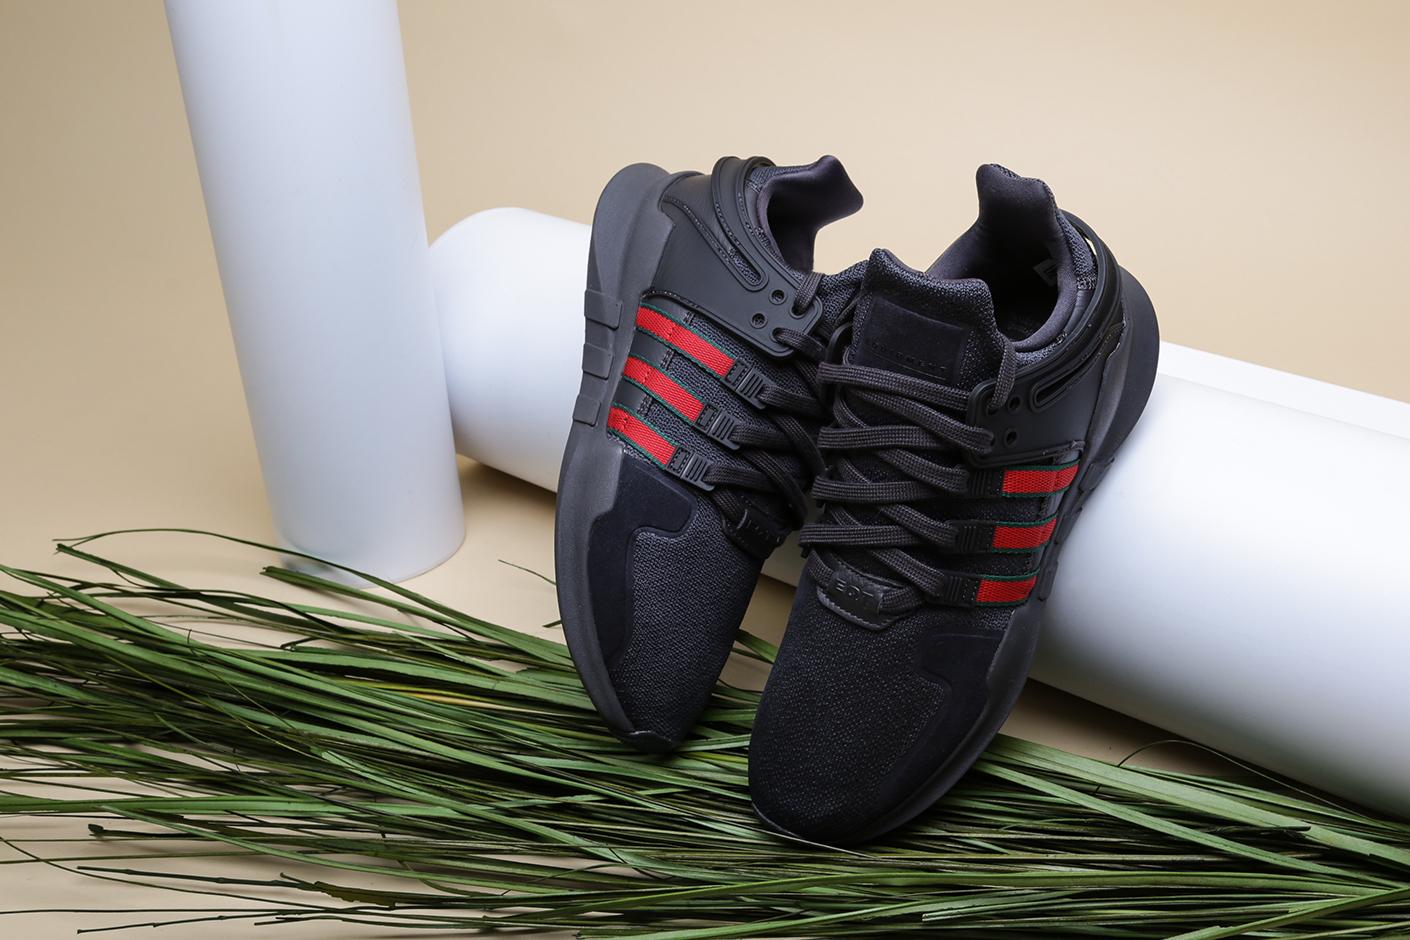 competitive price e849e 0f523 Купить черные мужские кроссовки EQT Support ADV от adidas ...